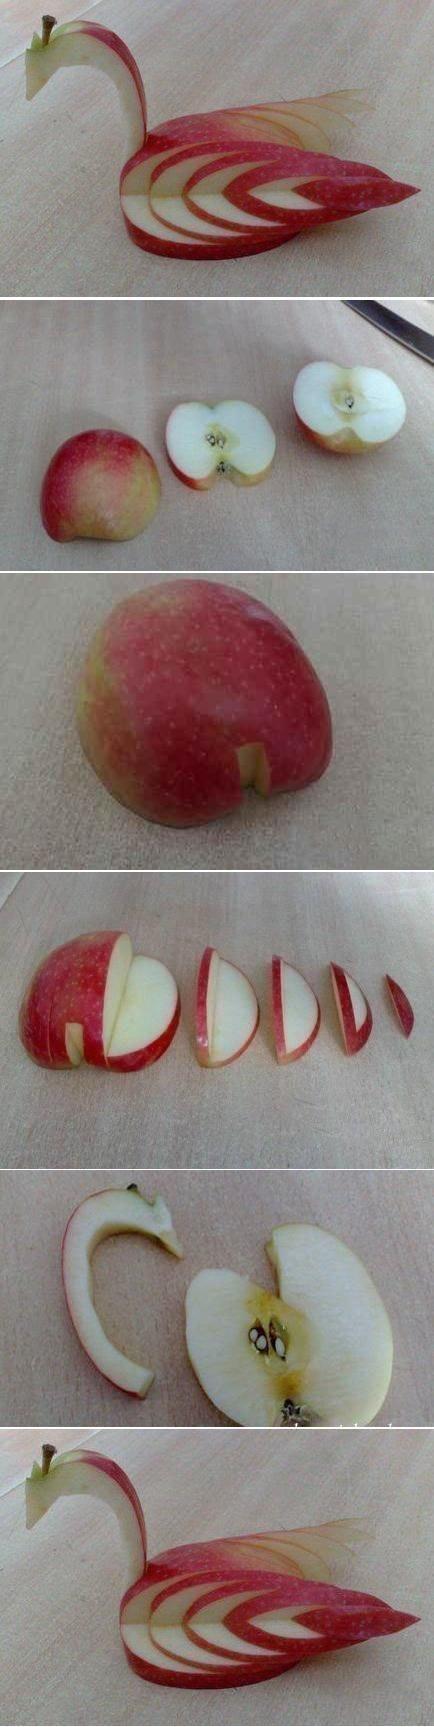 DIY Apple Swan DIY Apple Swan